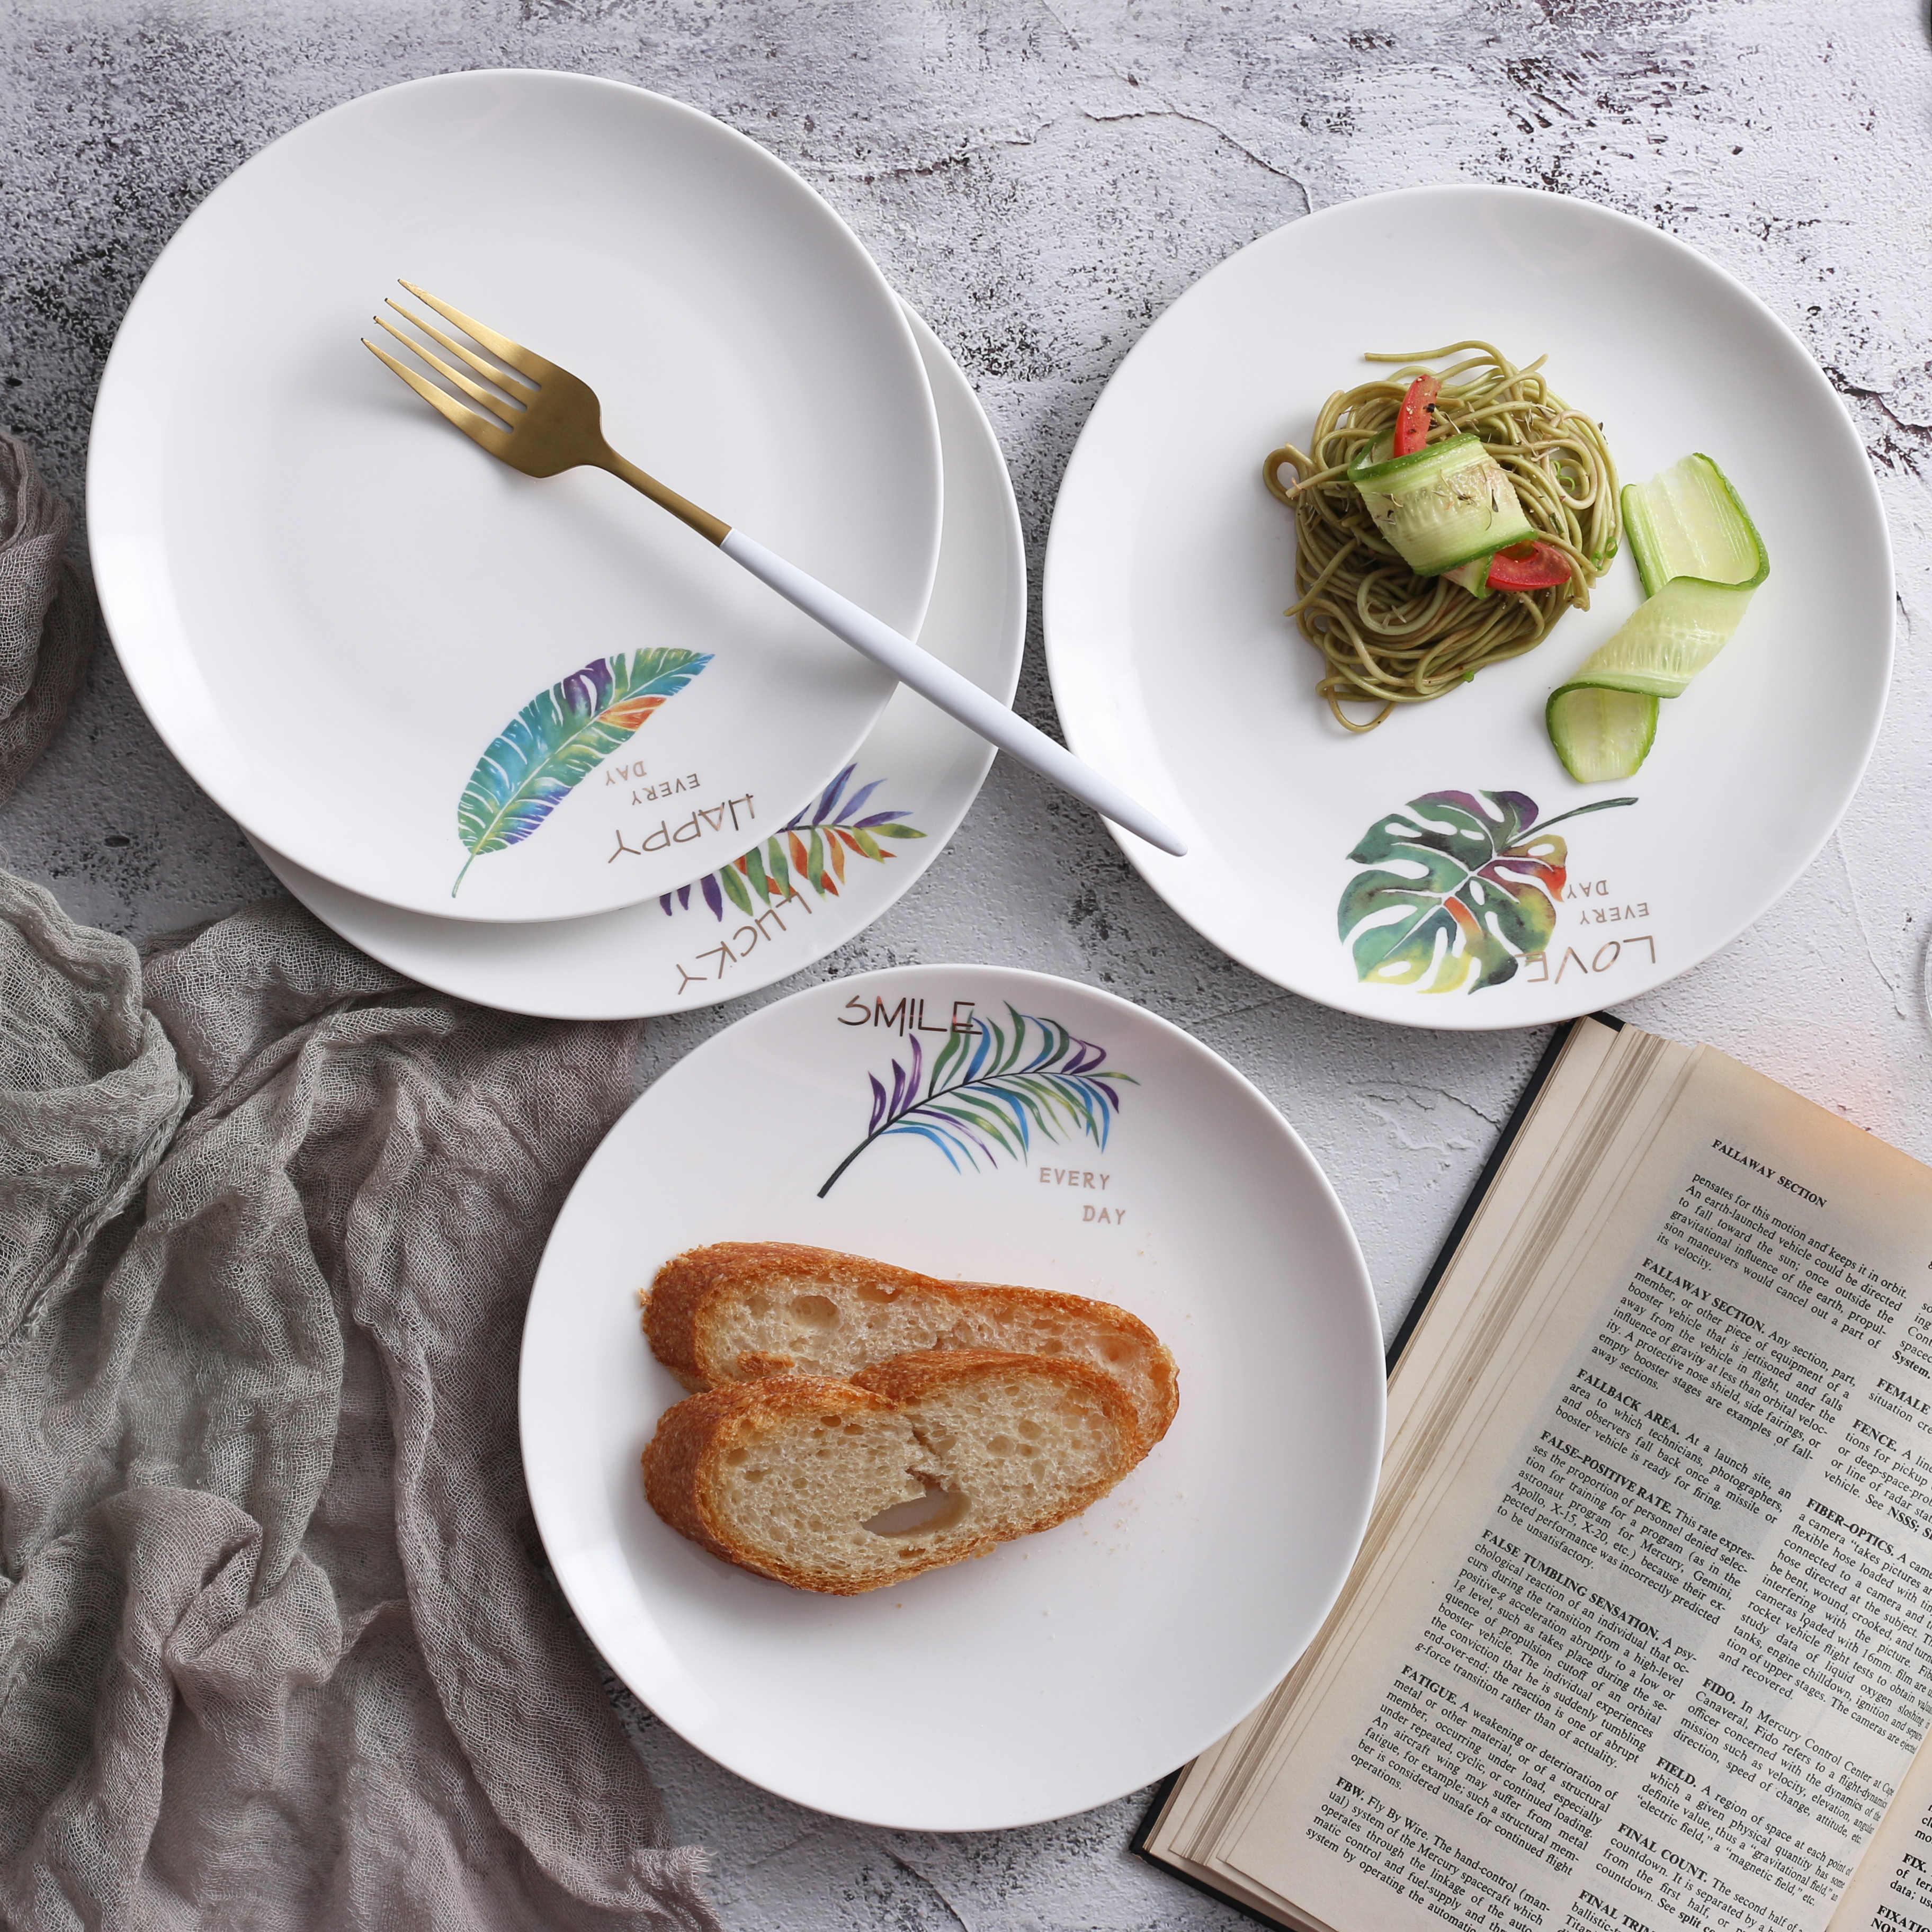 8 Inch Round Plate Ceramic Dinner Plate Dish Porcelain Dessert Plate Dinnerware Cake Plate Daily Uses Home Tableware